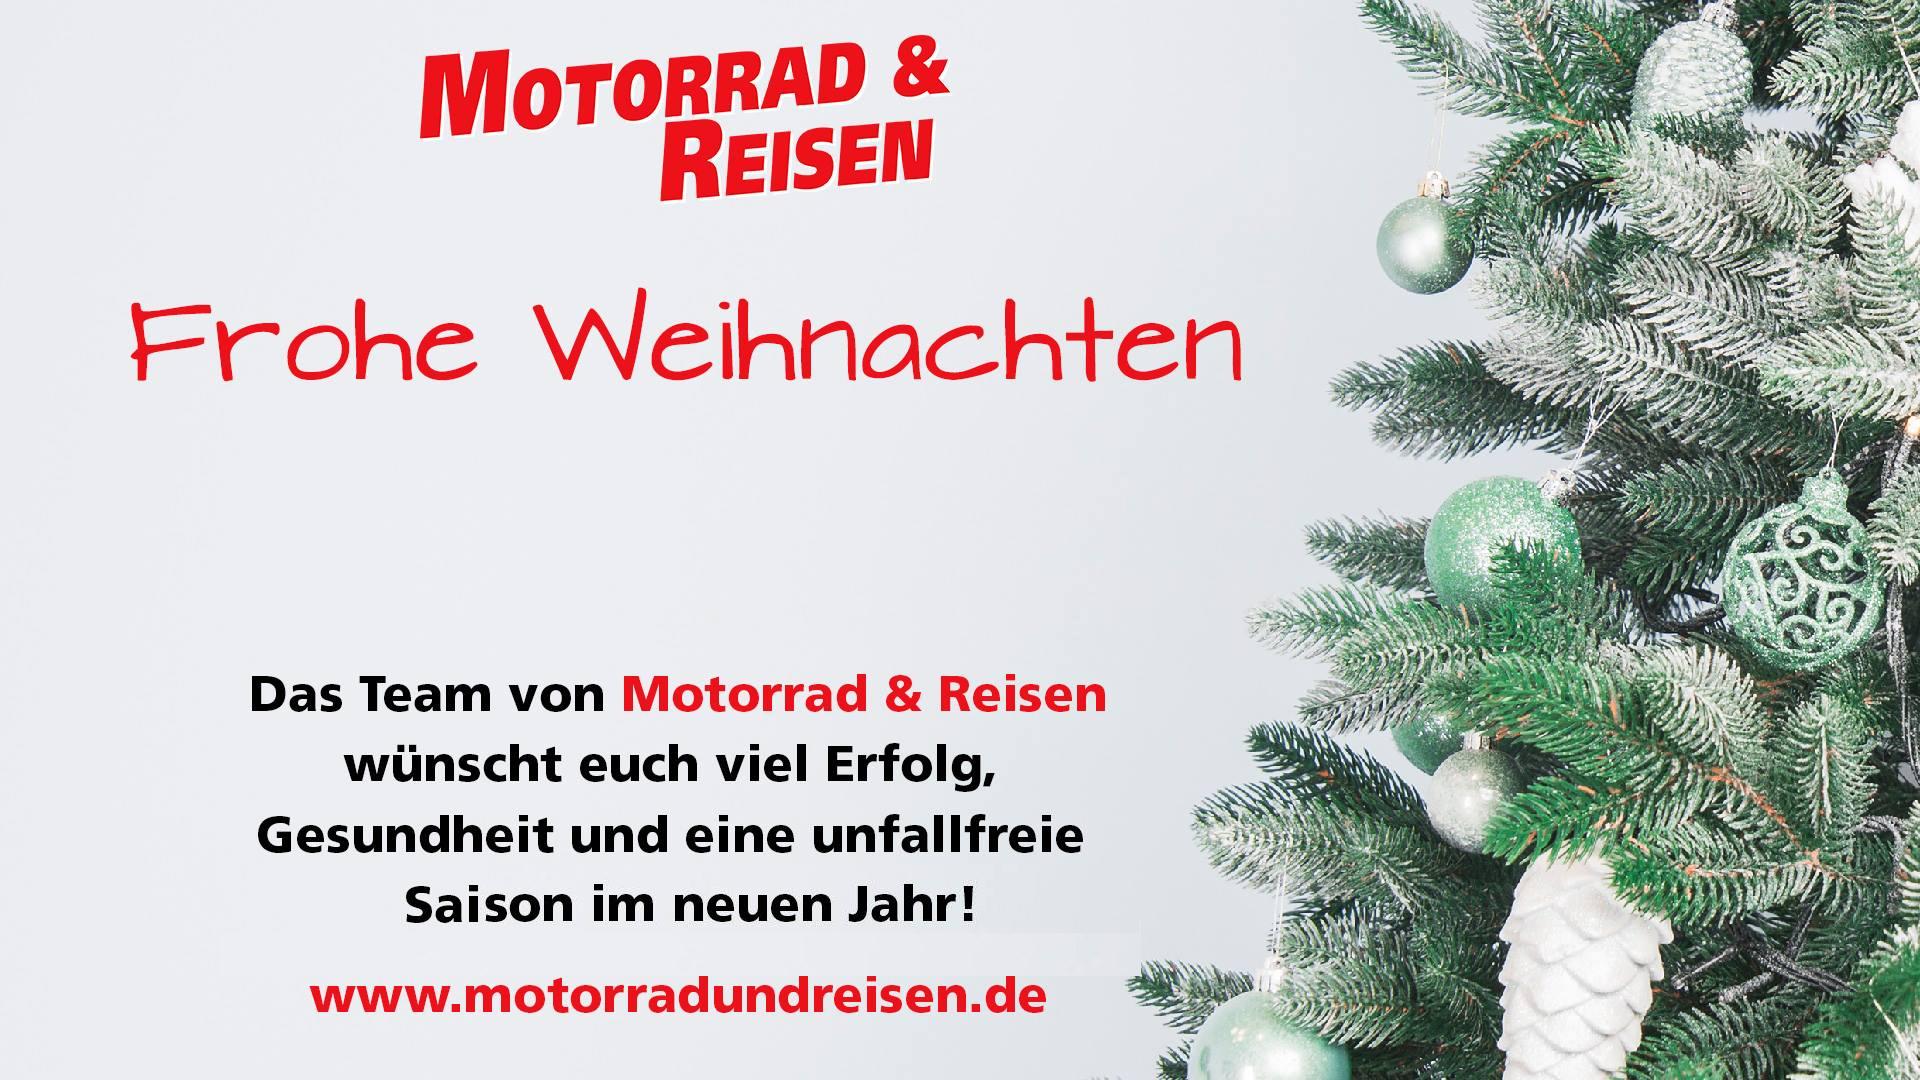 Frohe Weihnachten Motorrad.Motorrad Reisen Wunscht Frohe Weihnachten Motor